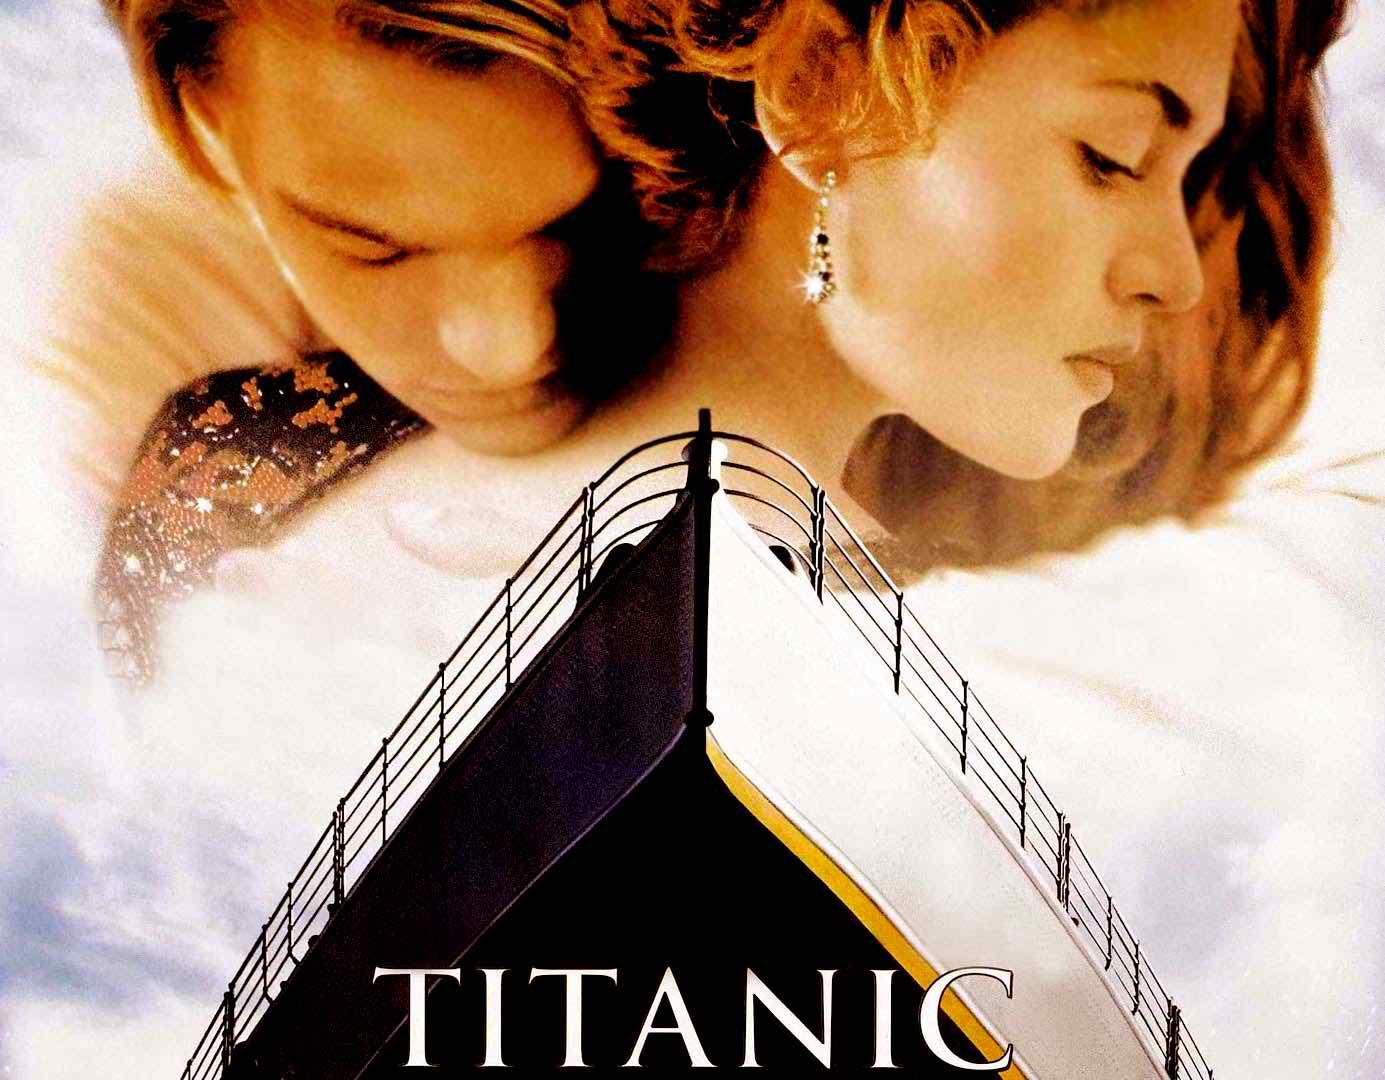 Titanic Movie Free Download - MyDesignBlog24.Com